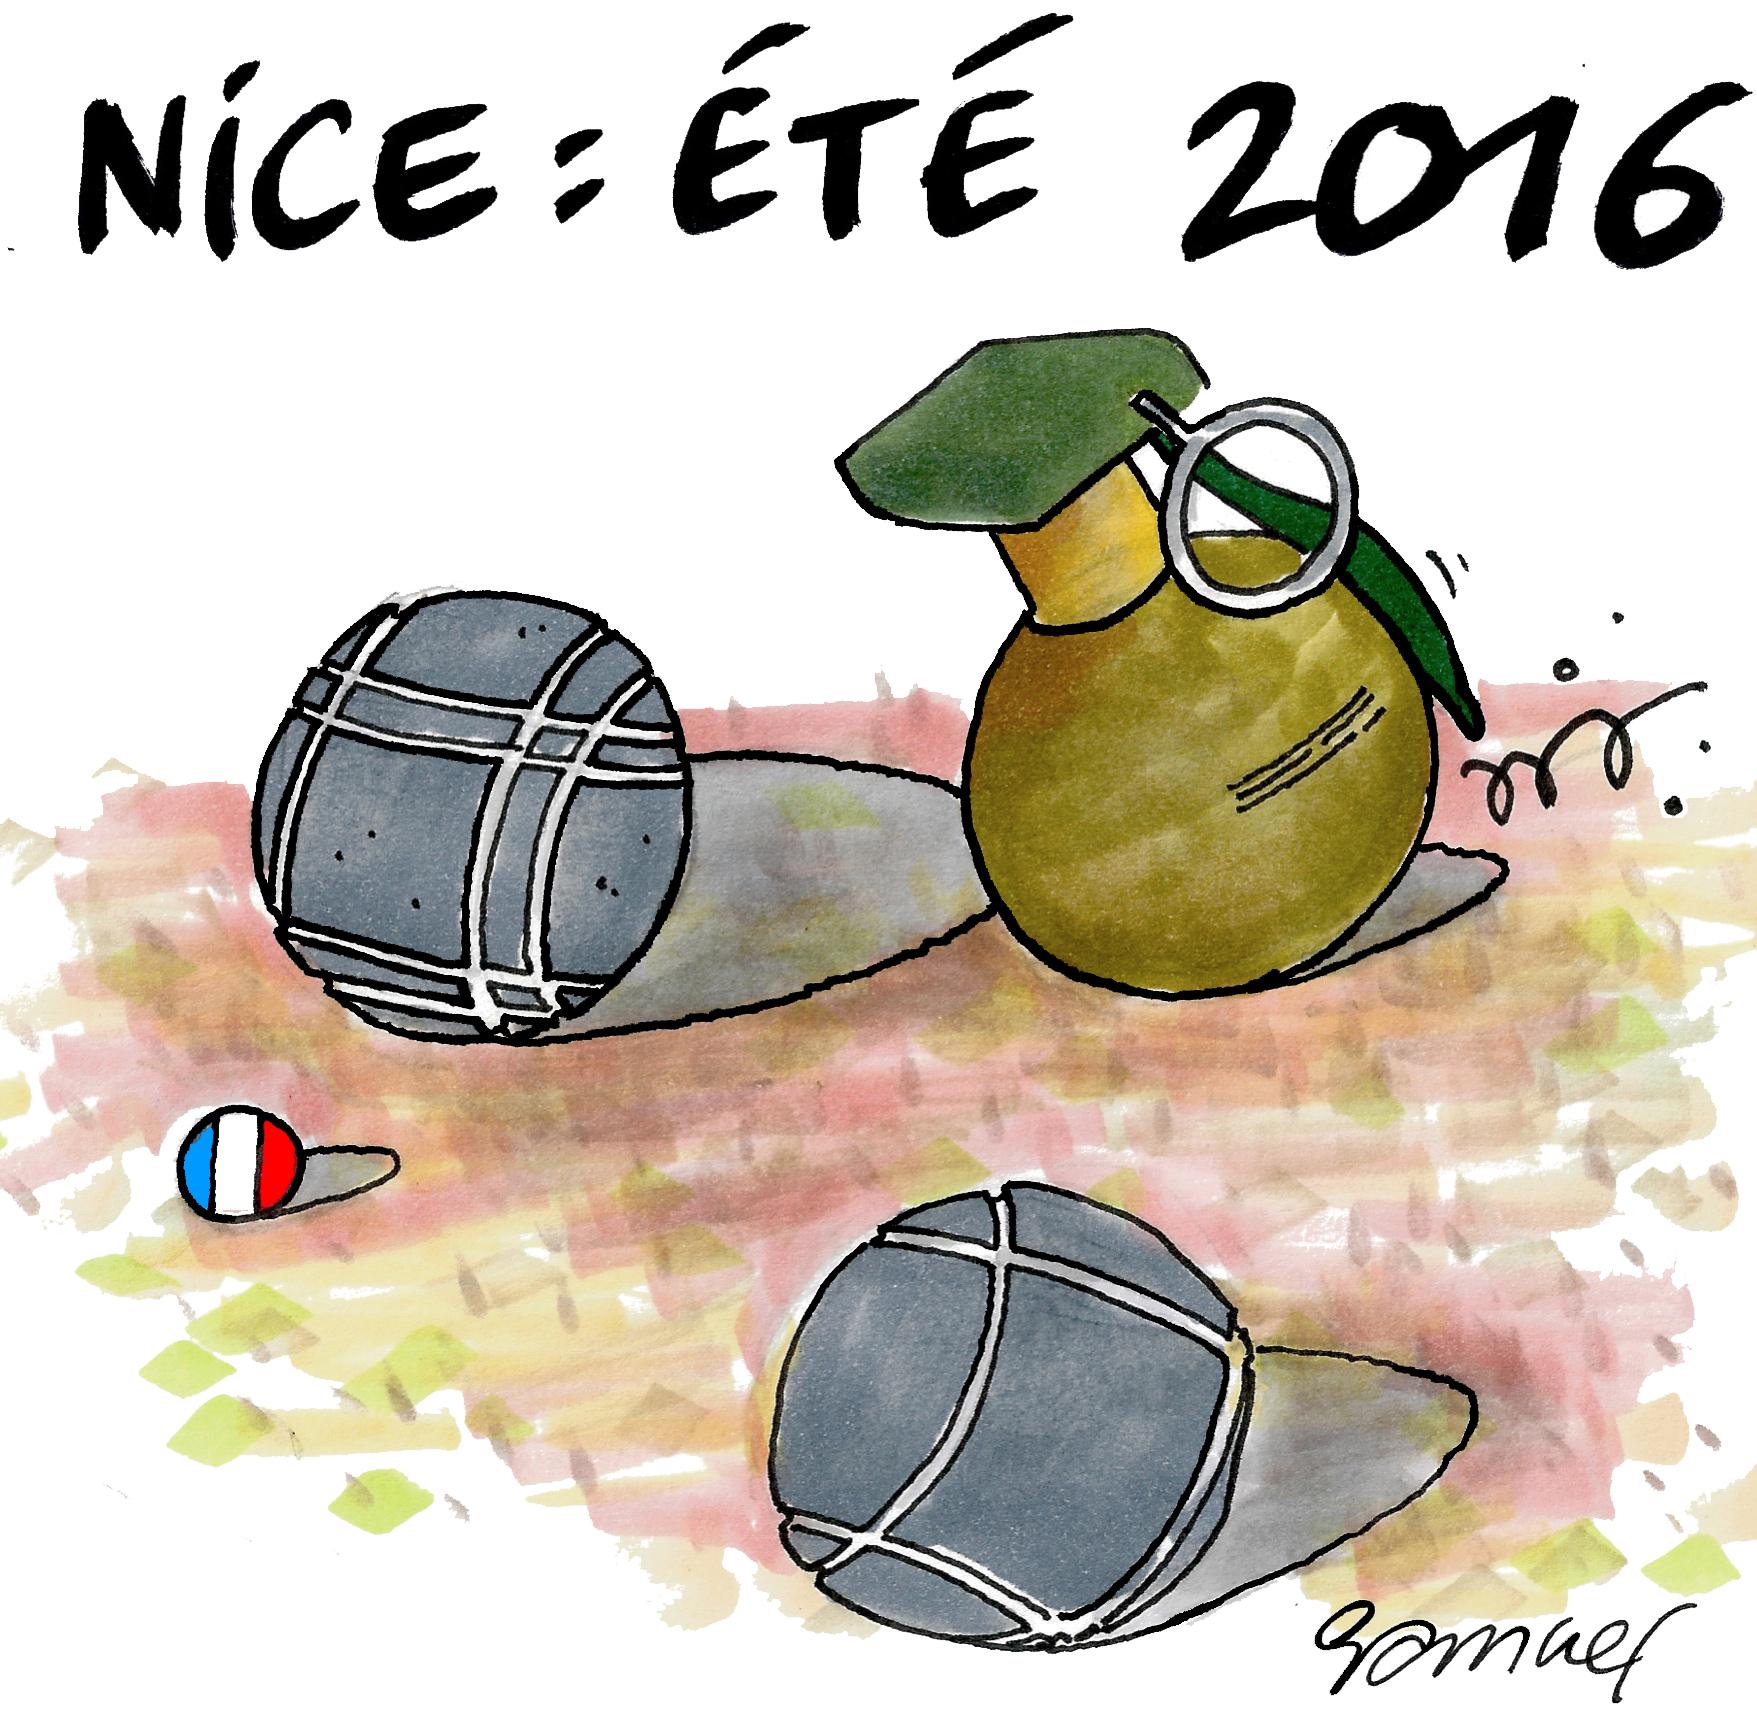 nice eěteě 2016